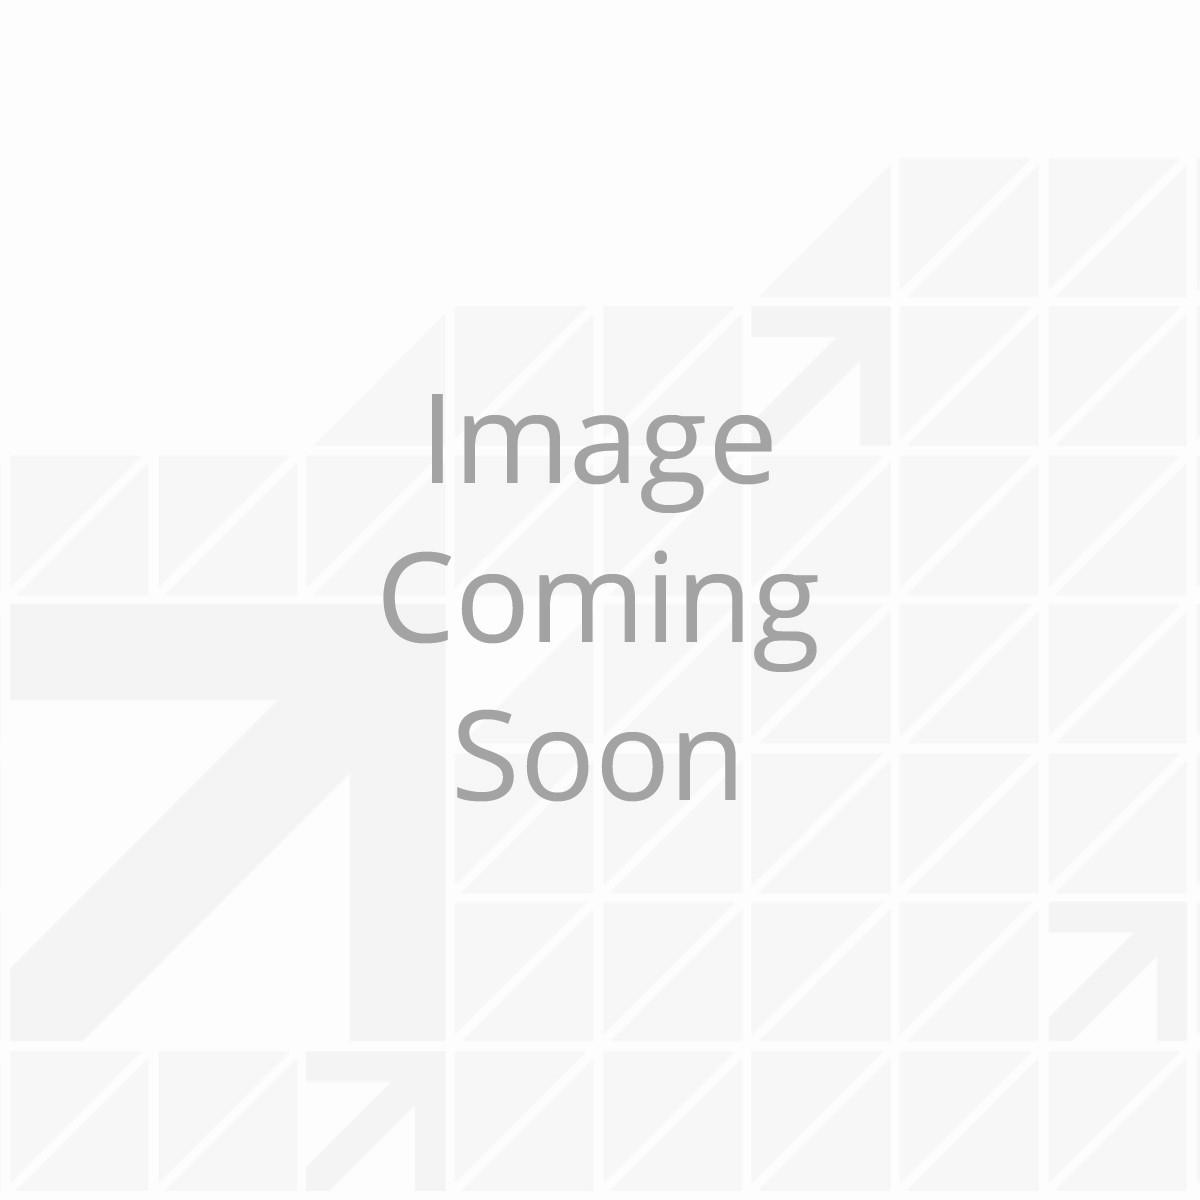 359413_-_pg_leveling_service_kit_-_001